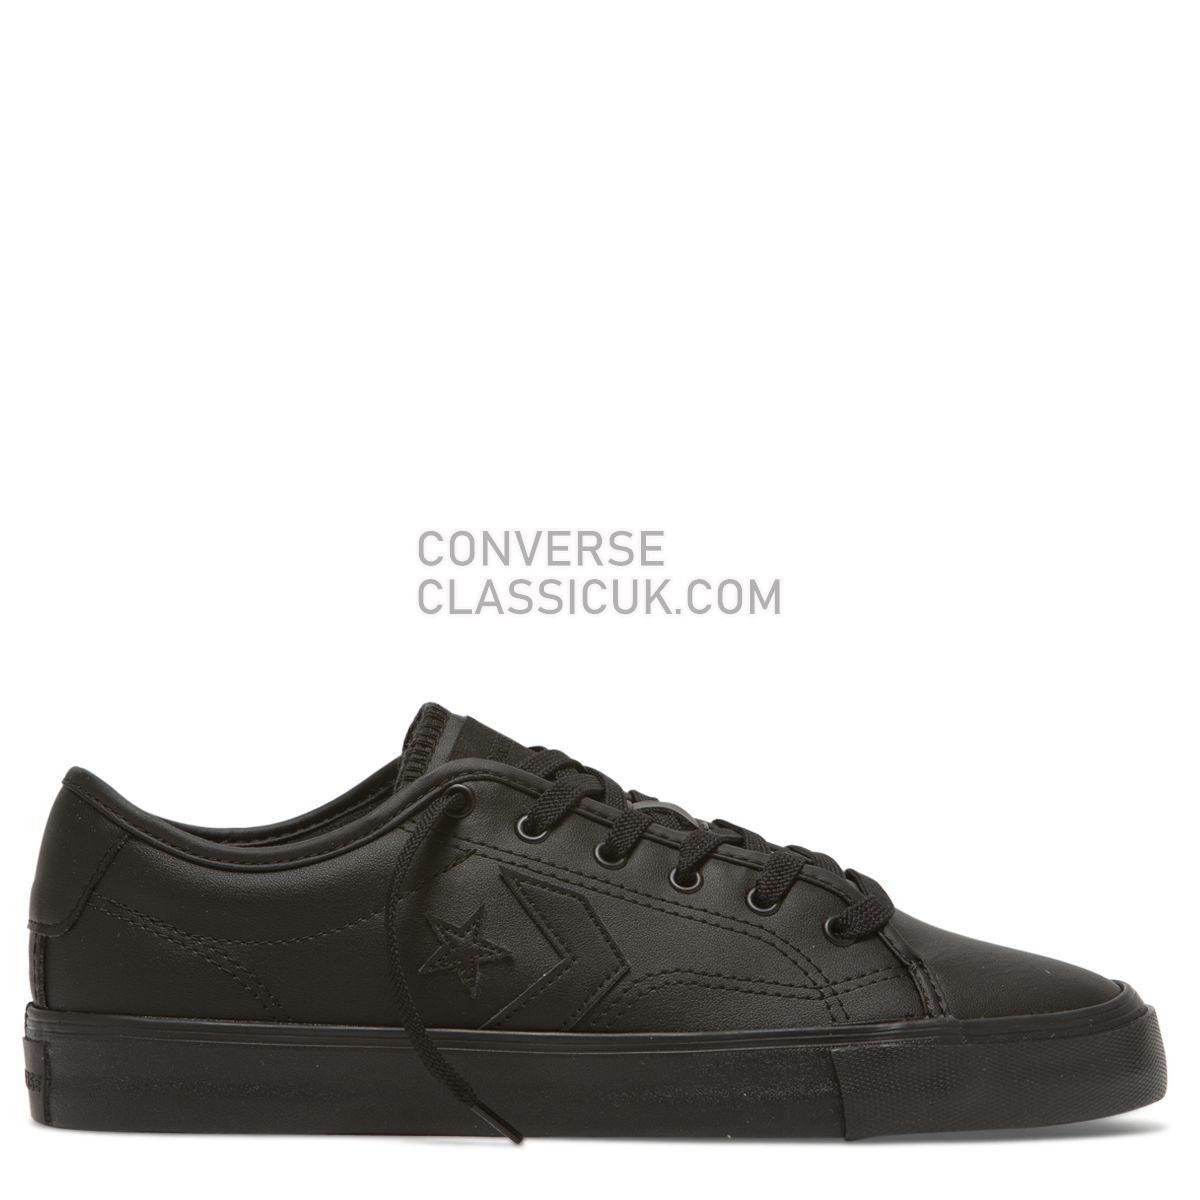 Converse Star Replay Low Top Black Mens 164543 Black/Black/Black Shoes